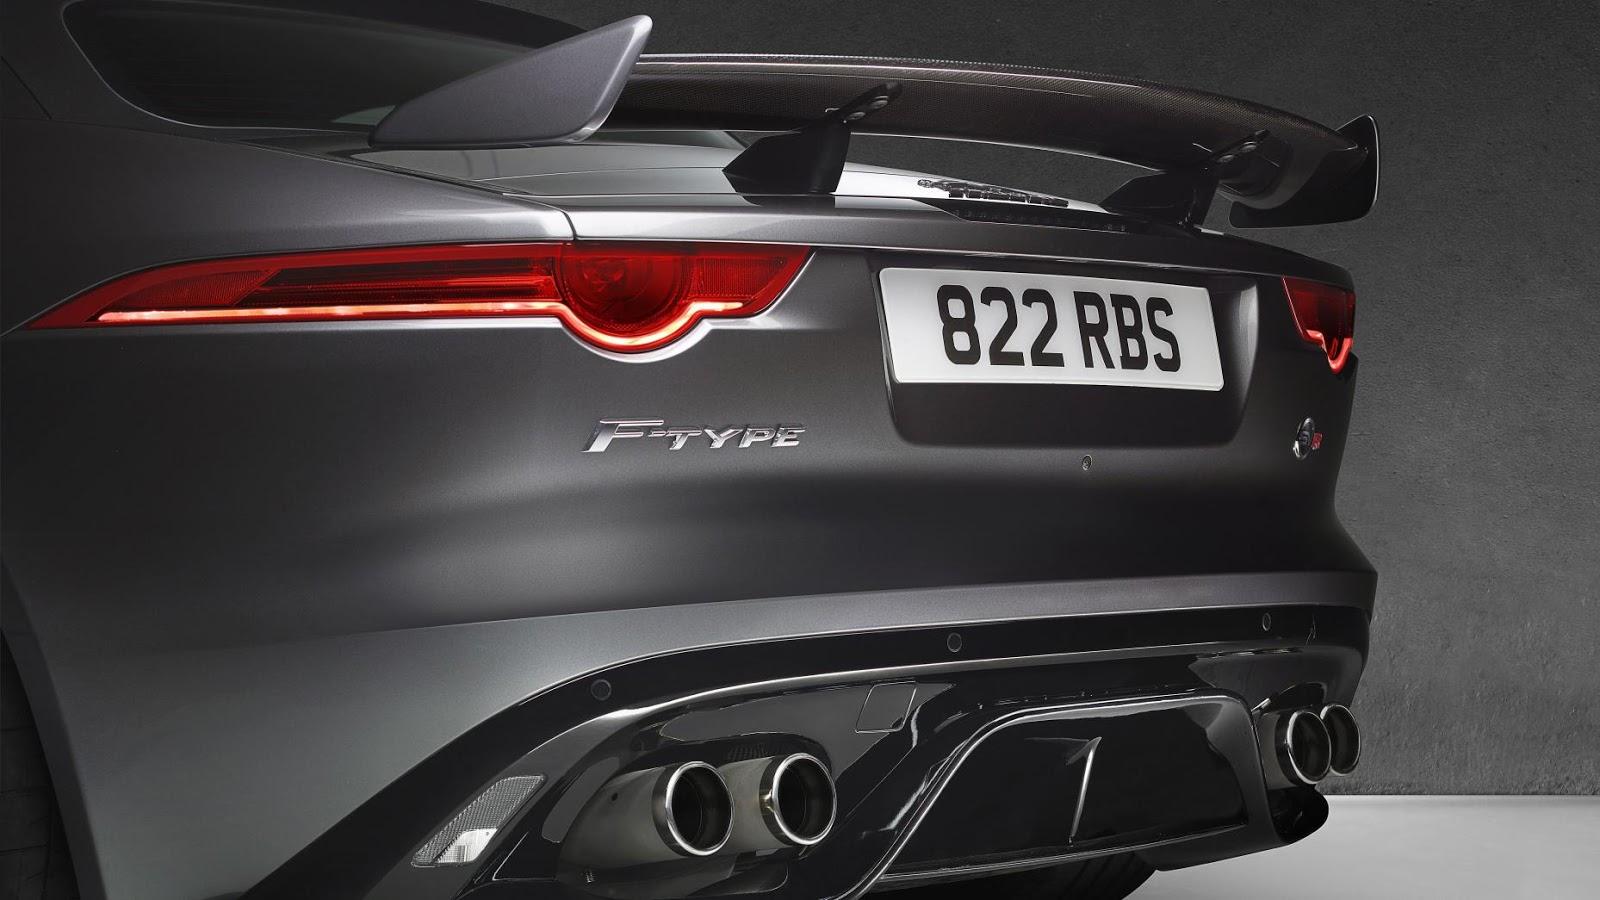 2016 Jaguar F-Type SVR